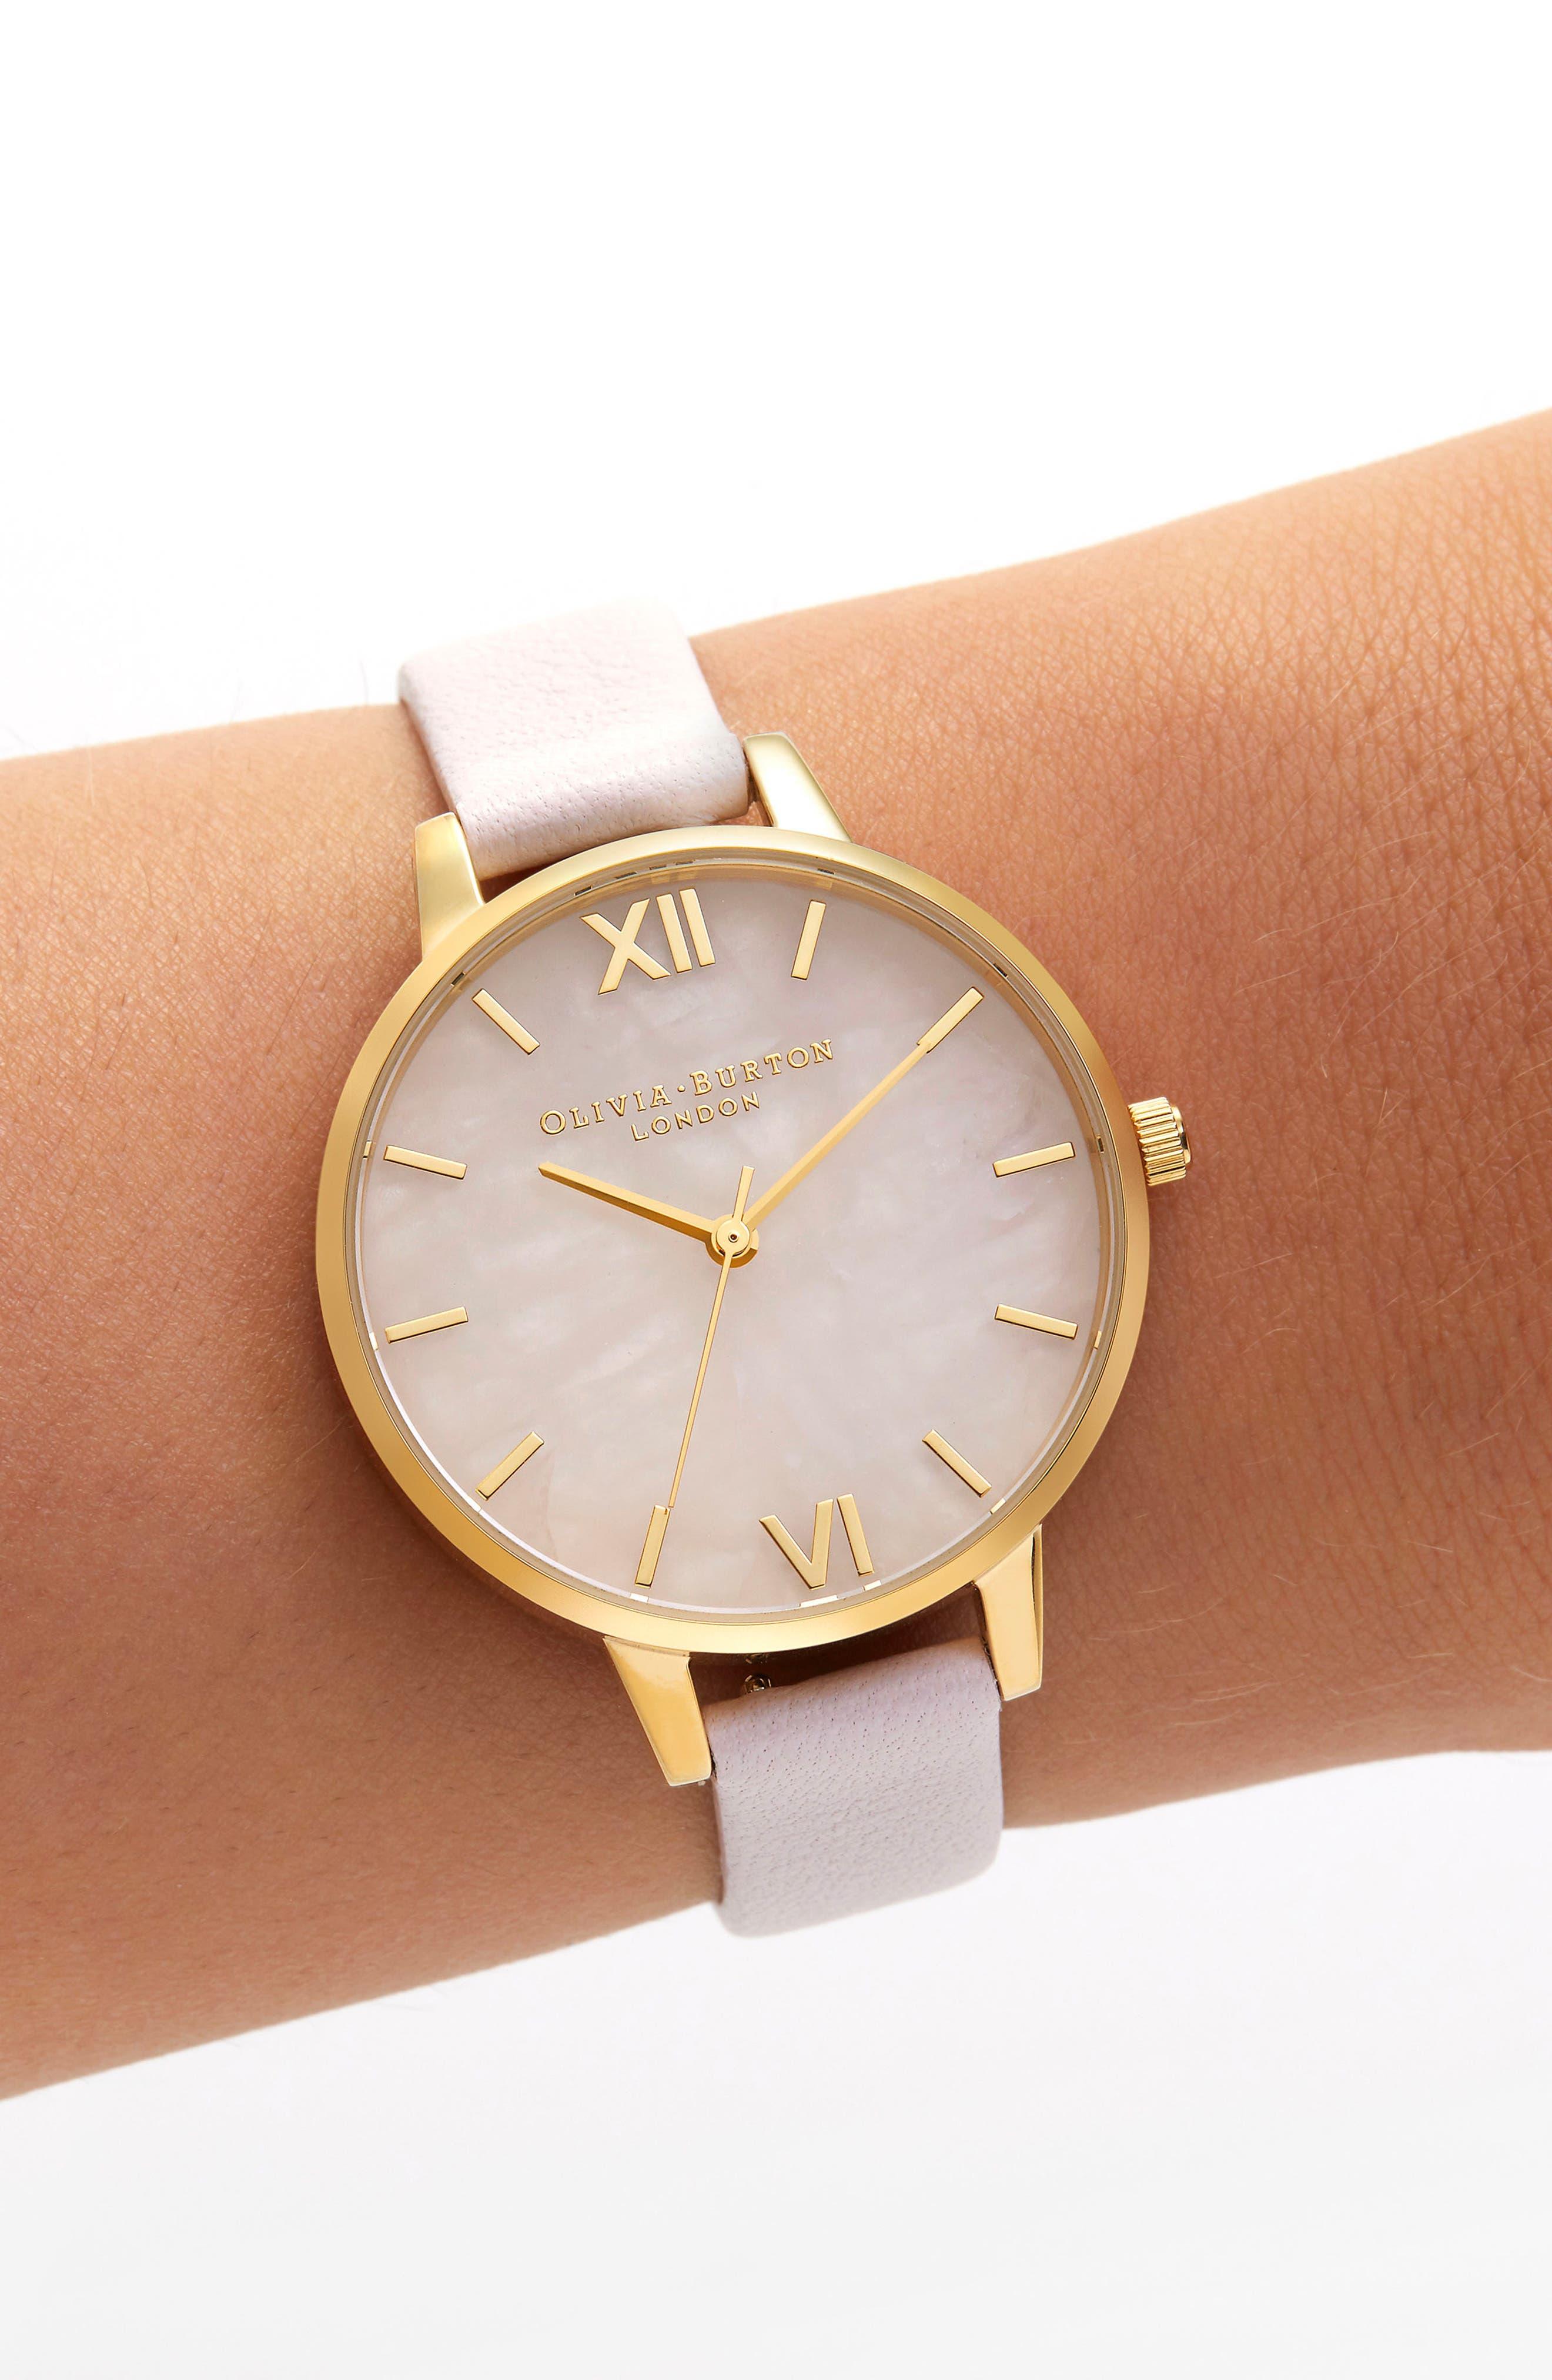 Rose Quartz Leather Strap Watch, 34mm,                             Alternate thumbnail 2, color,                             BLOSSOM/ ROSE QUARTZ/ GOLD